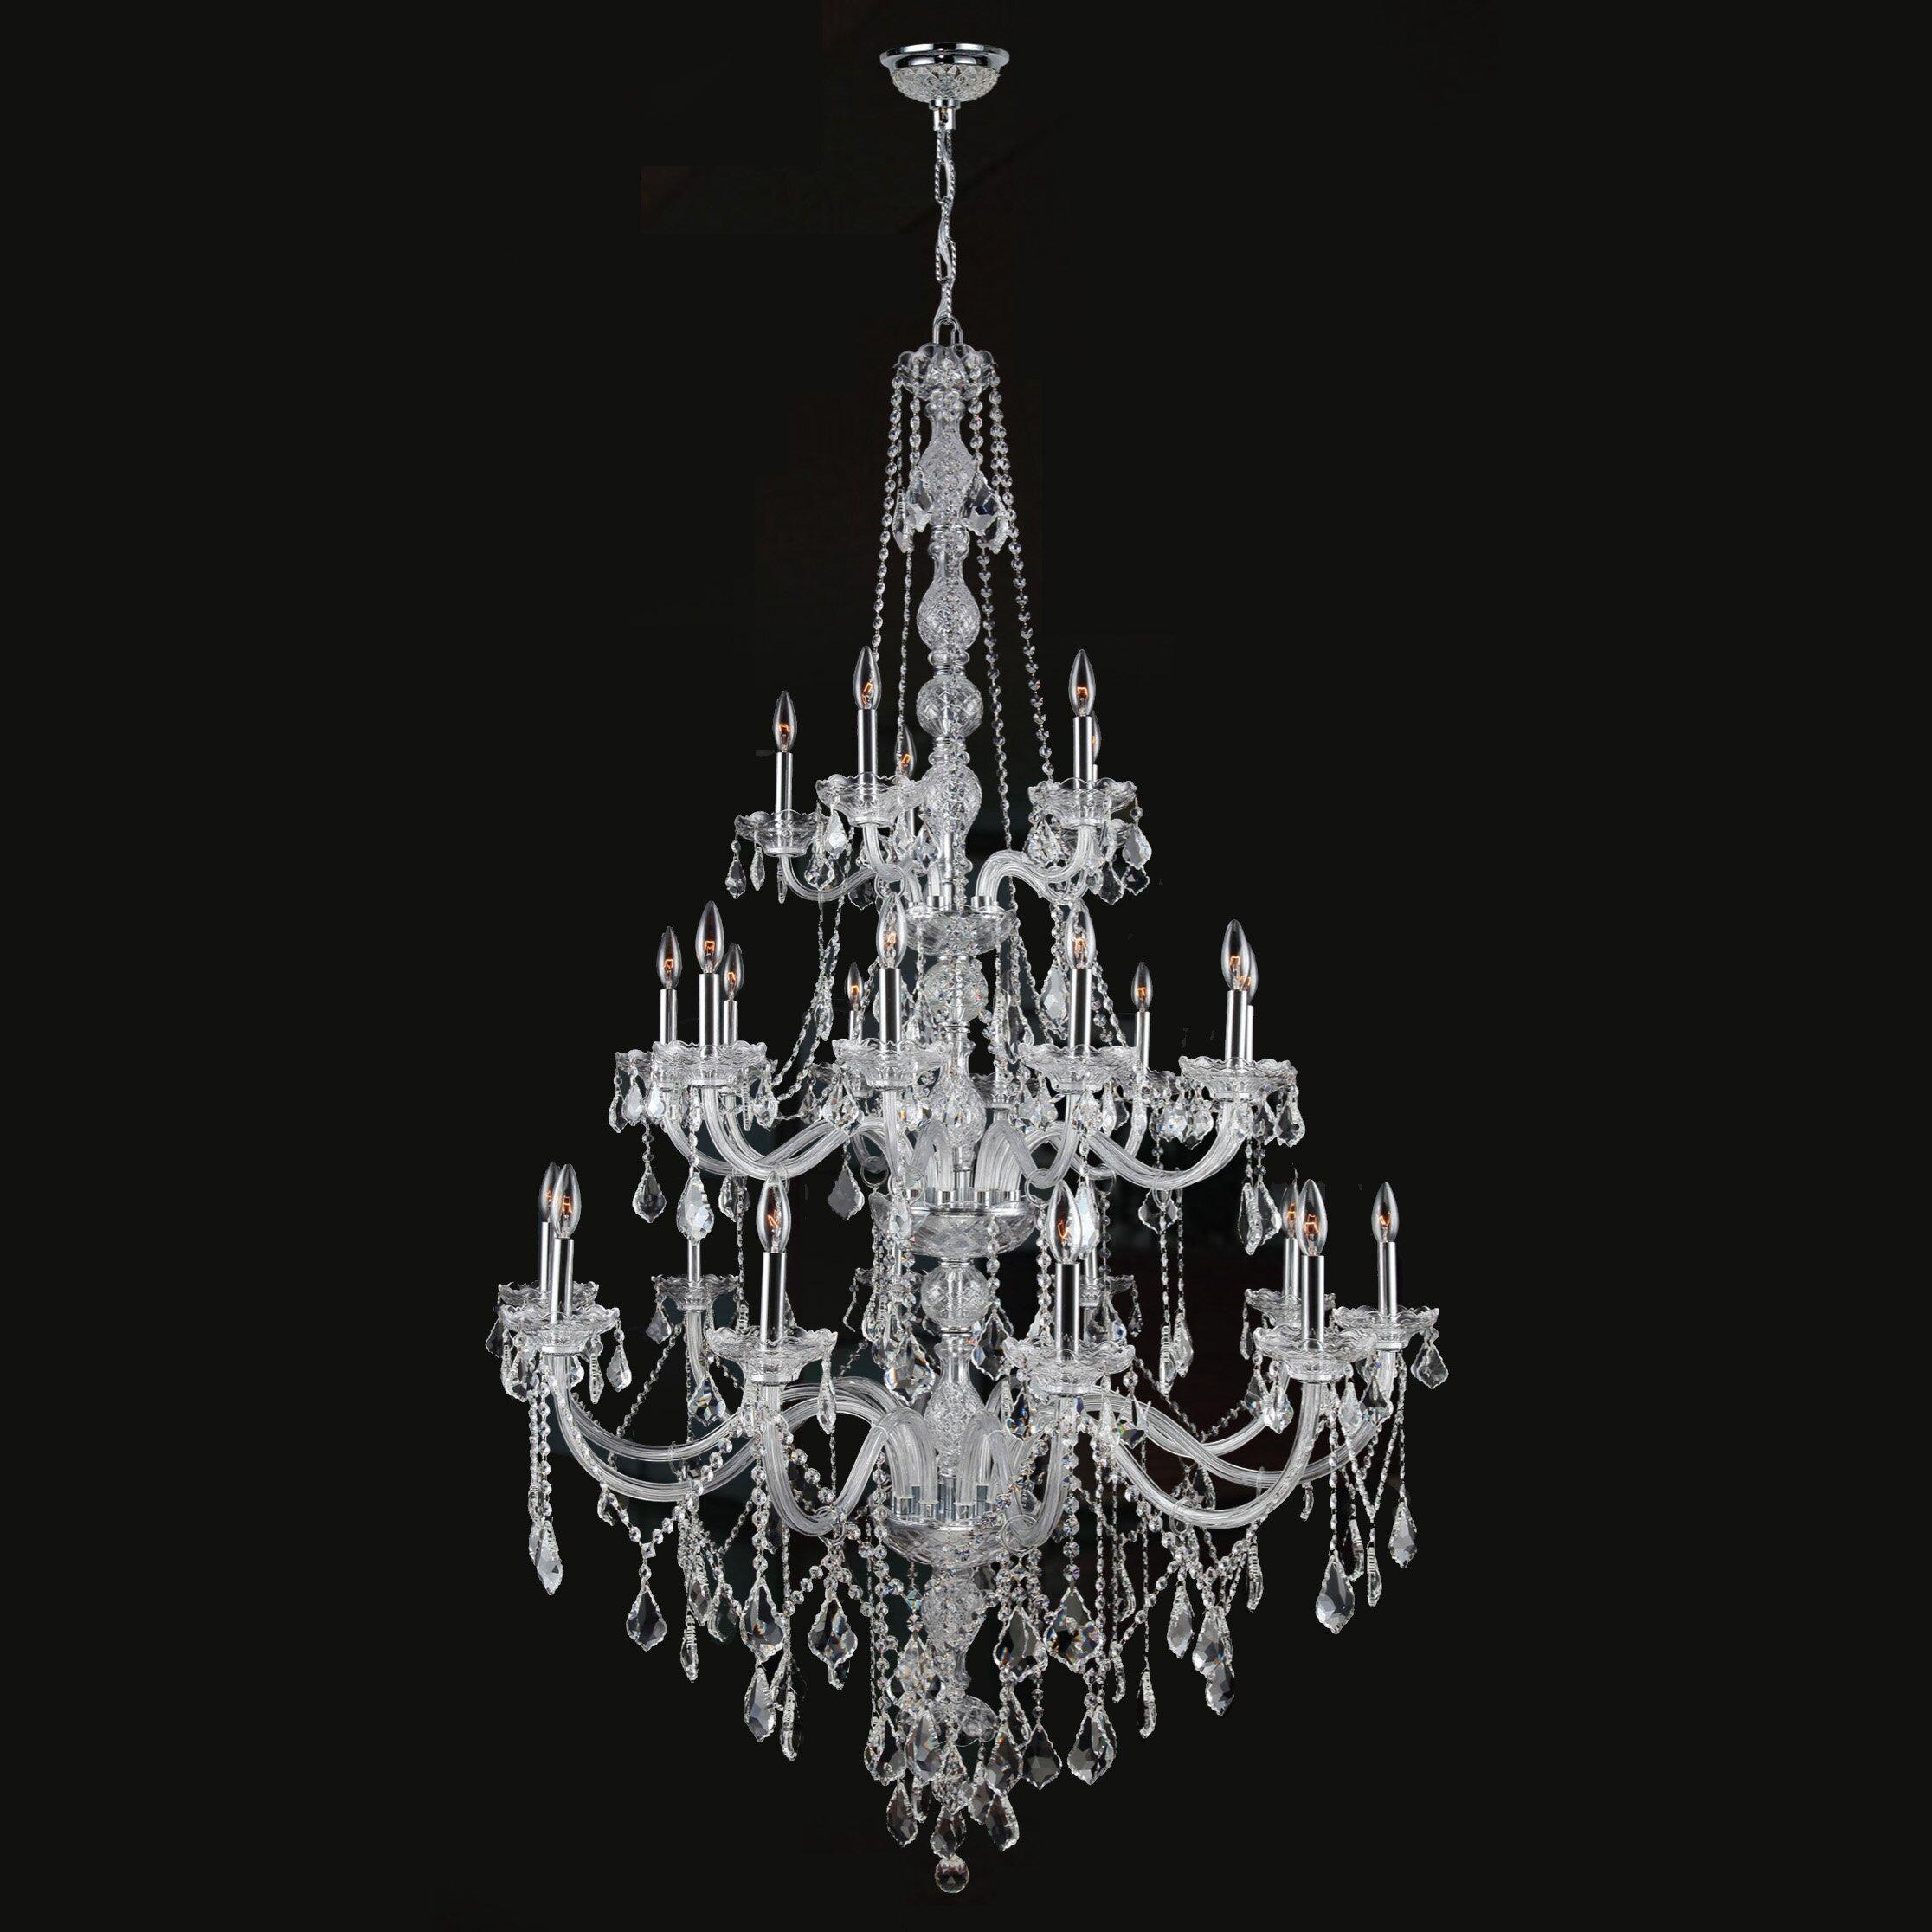 Worldwide Lighting Provence 25Light Crystal Chandelier Reviews – Crystal Chandelier Lights